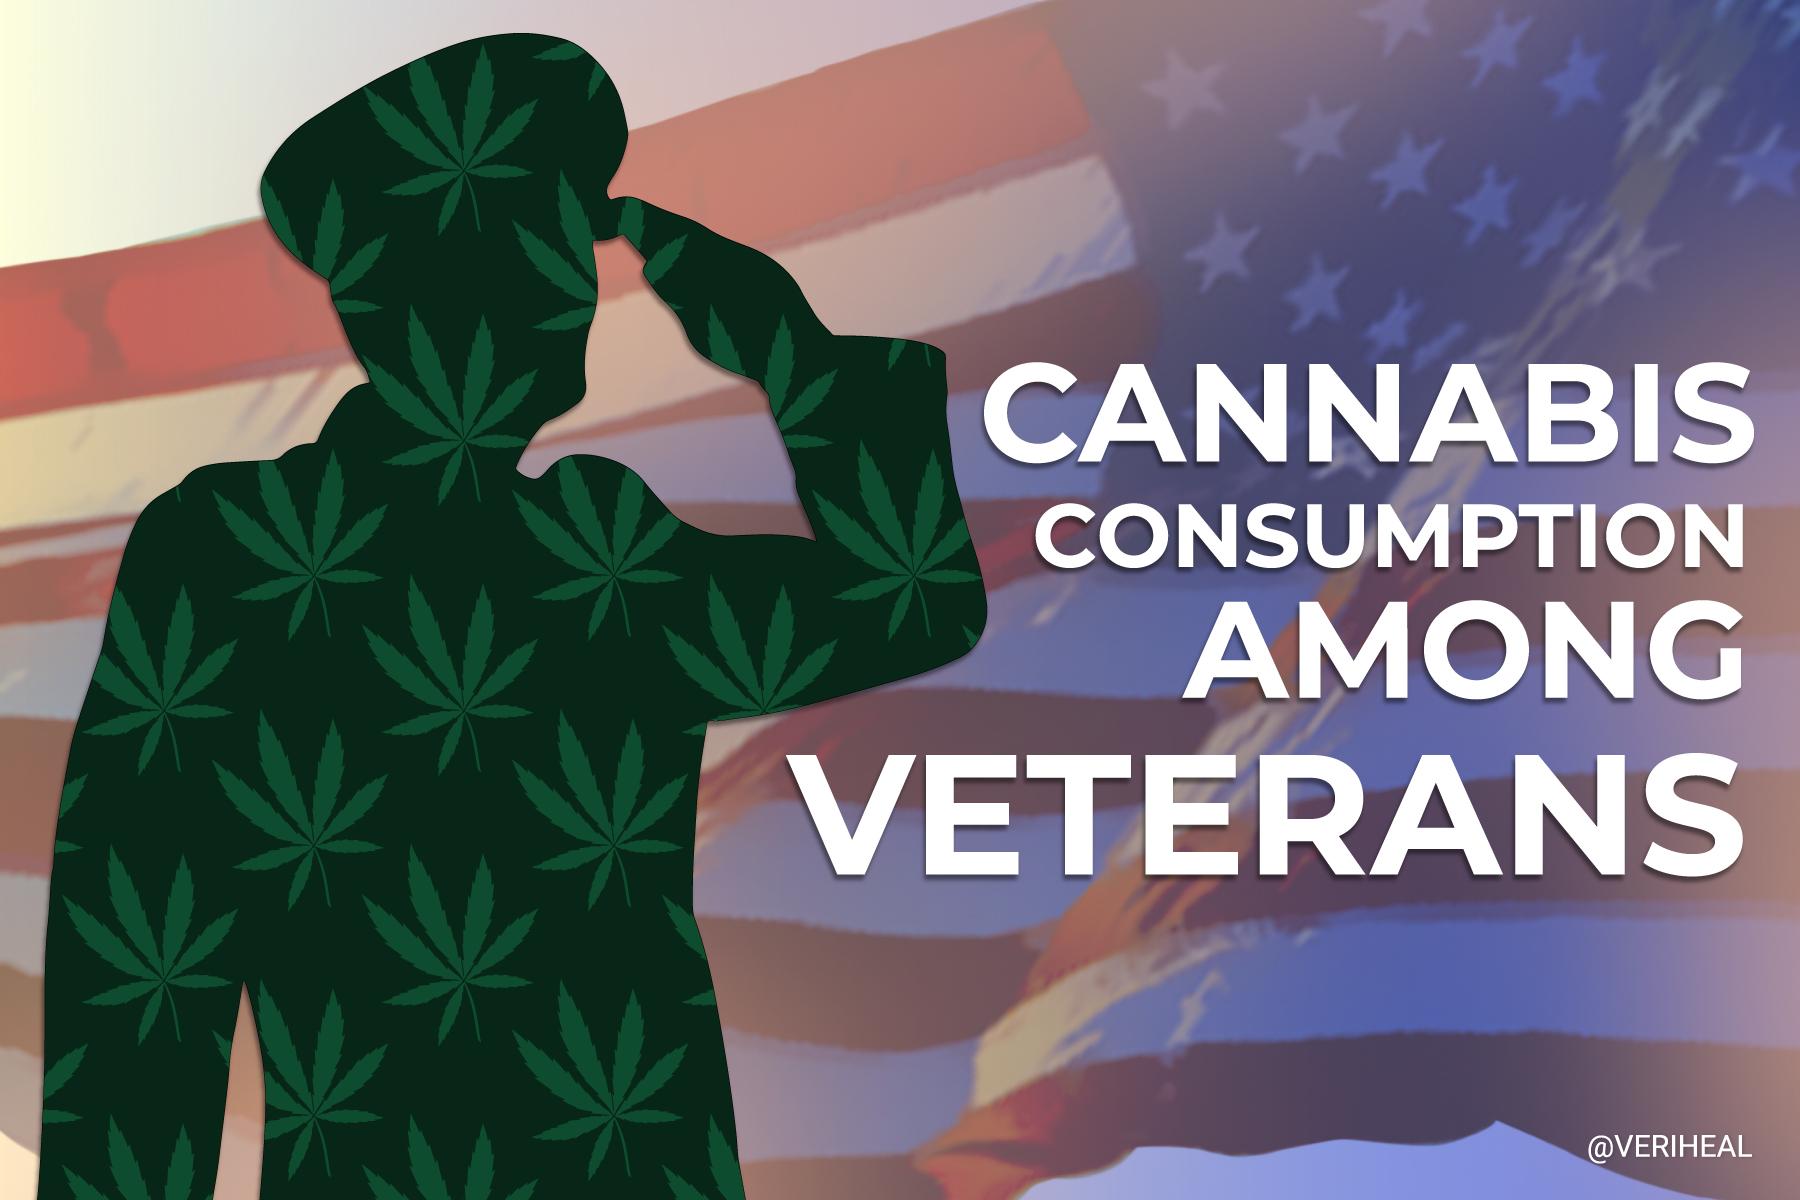 Researchers Study Cannabis Consumption Among Different Veteran Demographics